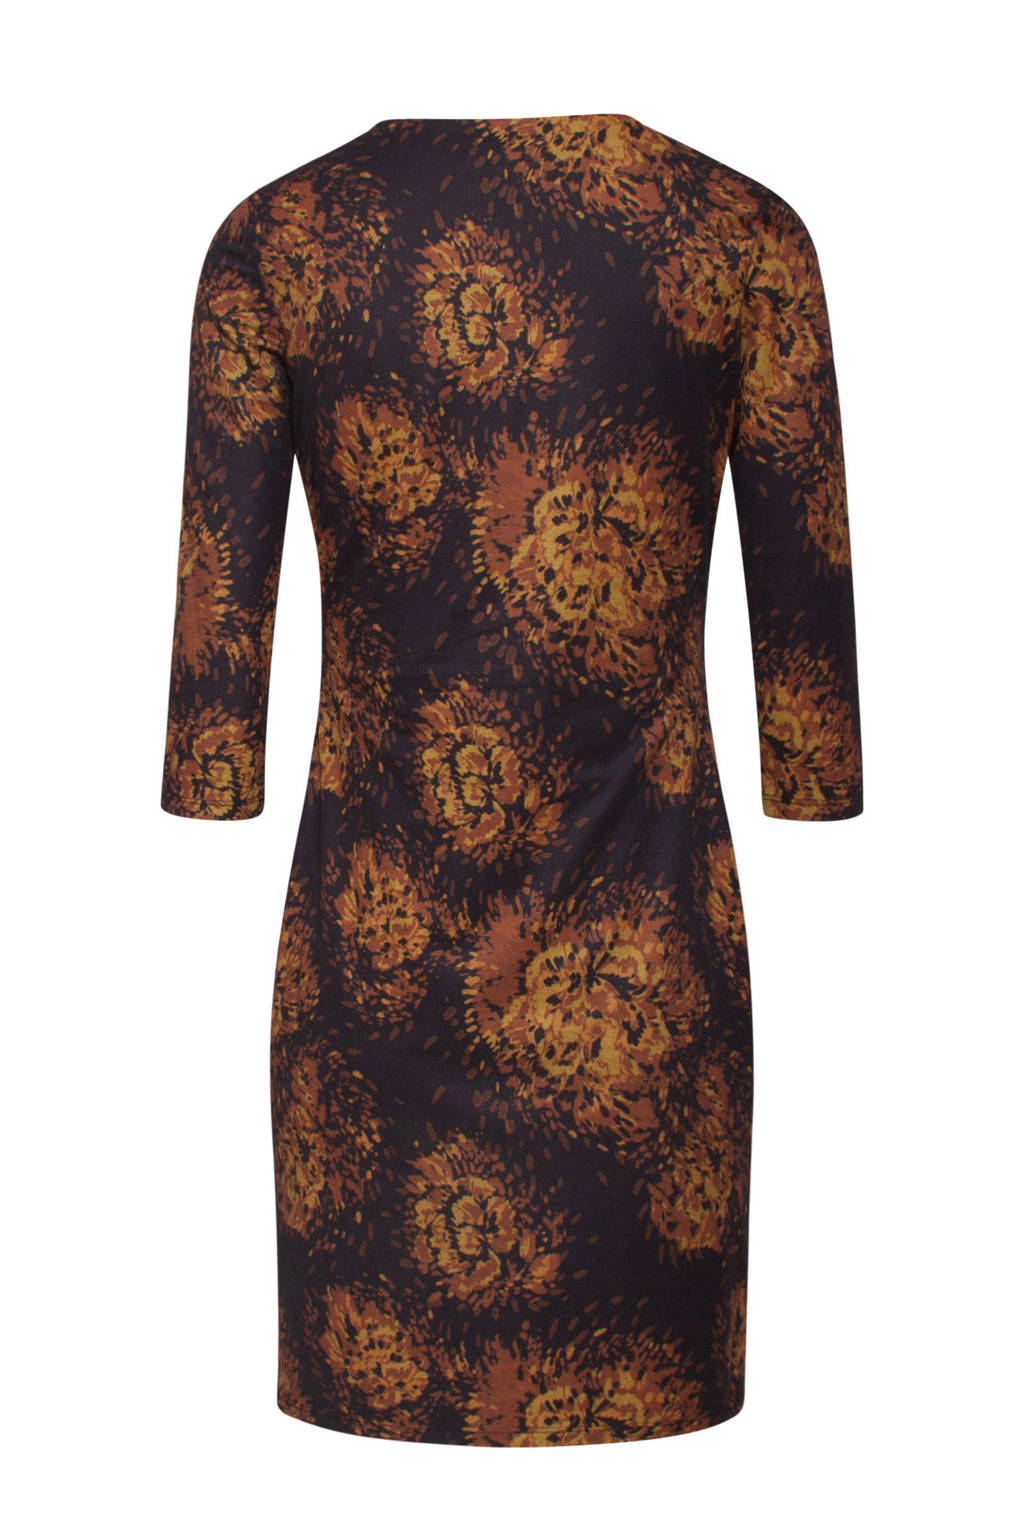 Smashed Lemon jurk met all over print donkerpaars/donker oranje/okergeel, Donkerpaars/donker oranje/okergeel